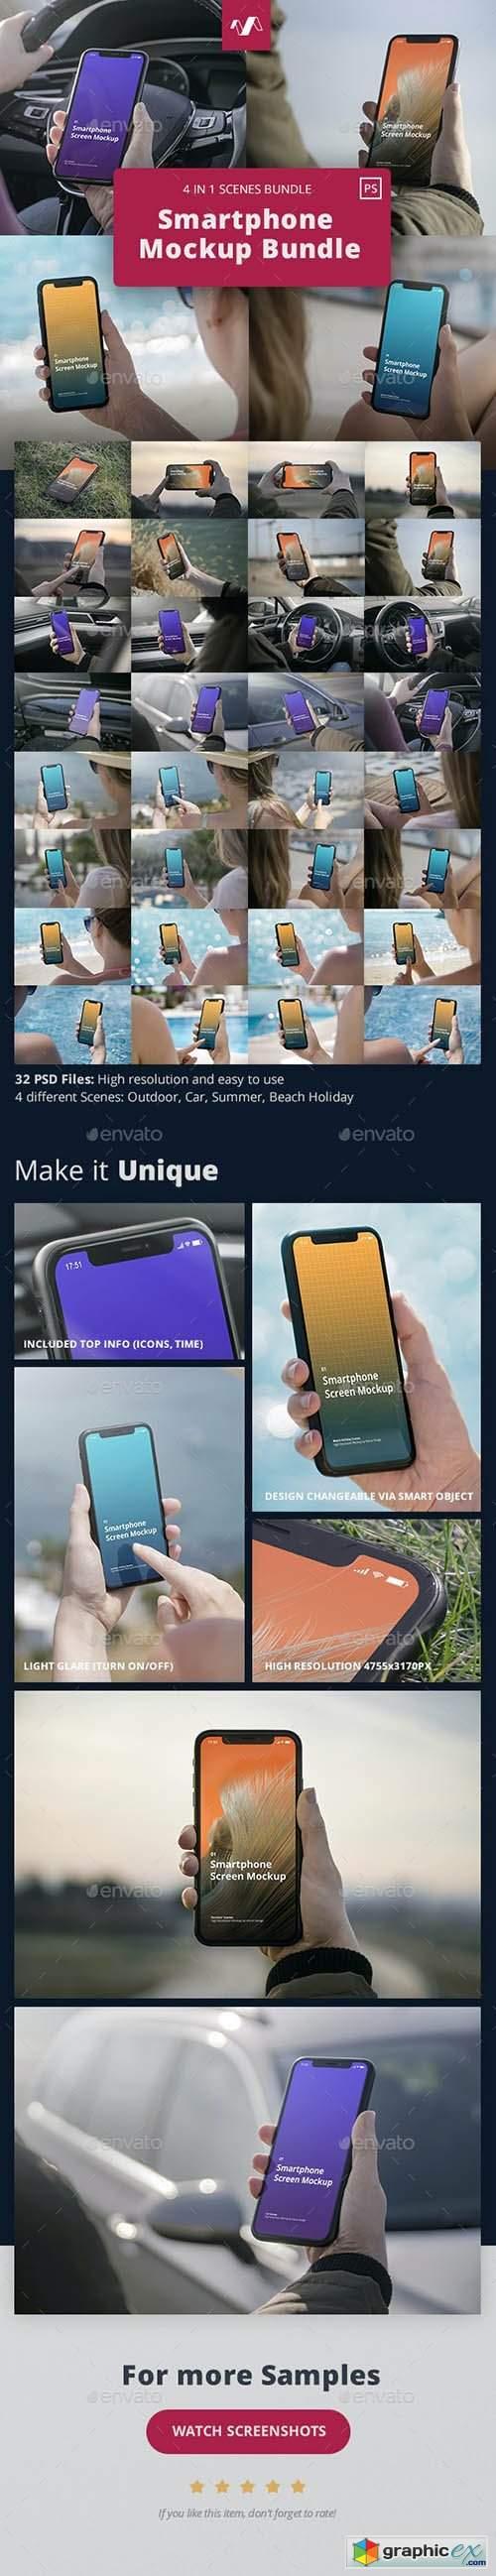 Phone Mockup Scenes Bundle